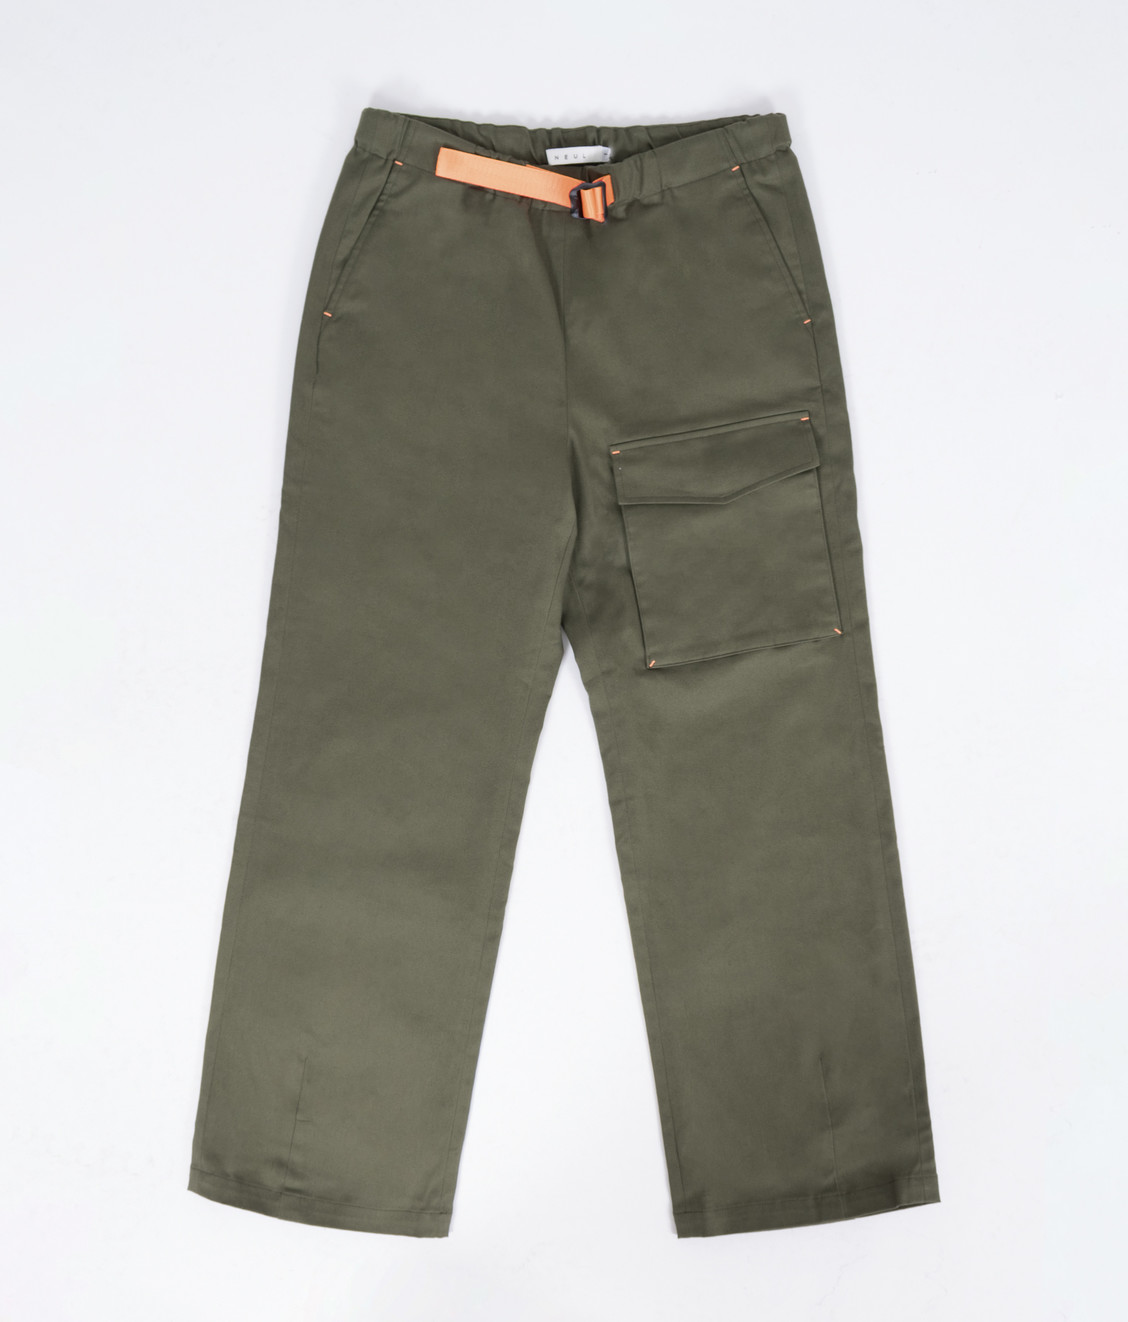 NEUL Neul Color Pointed Webbing Belt Pants Khaki